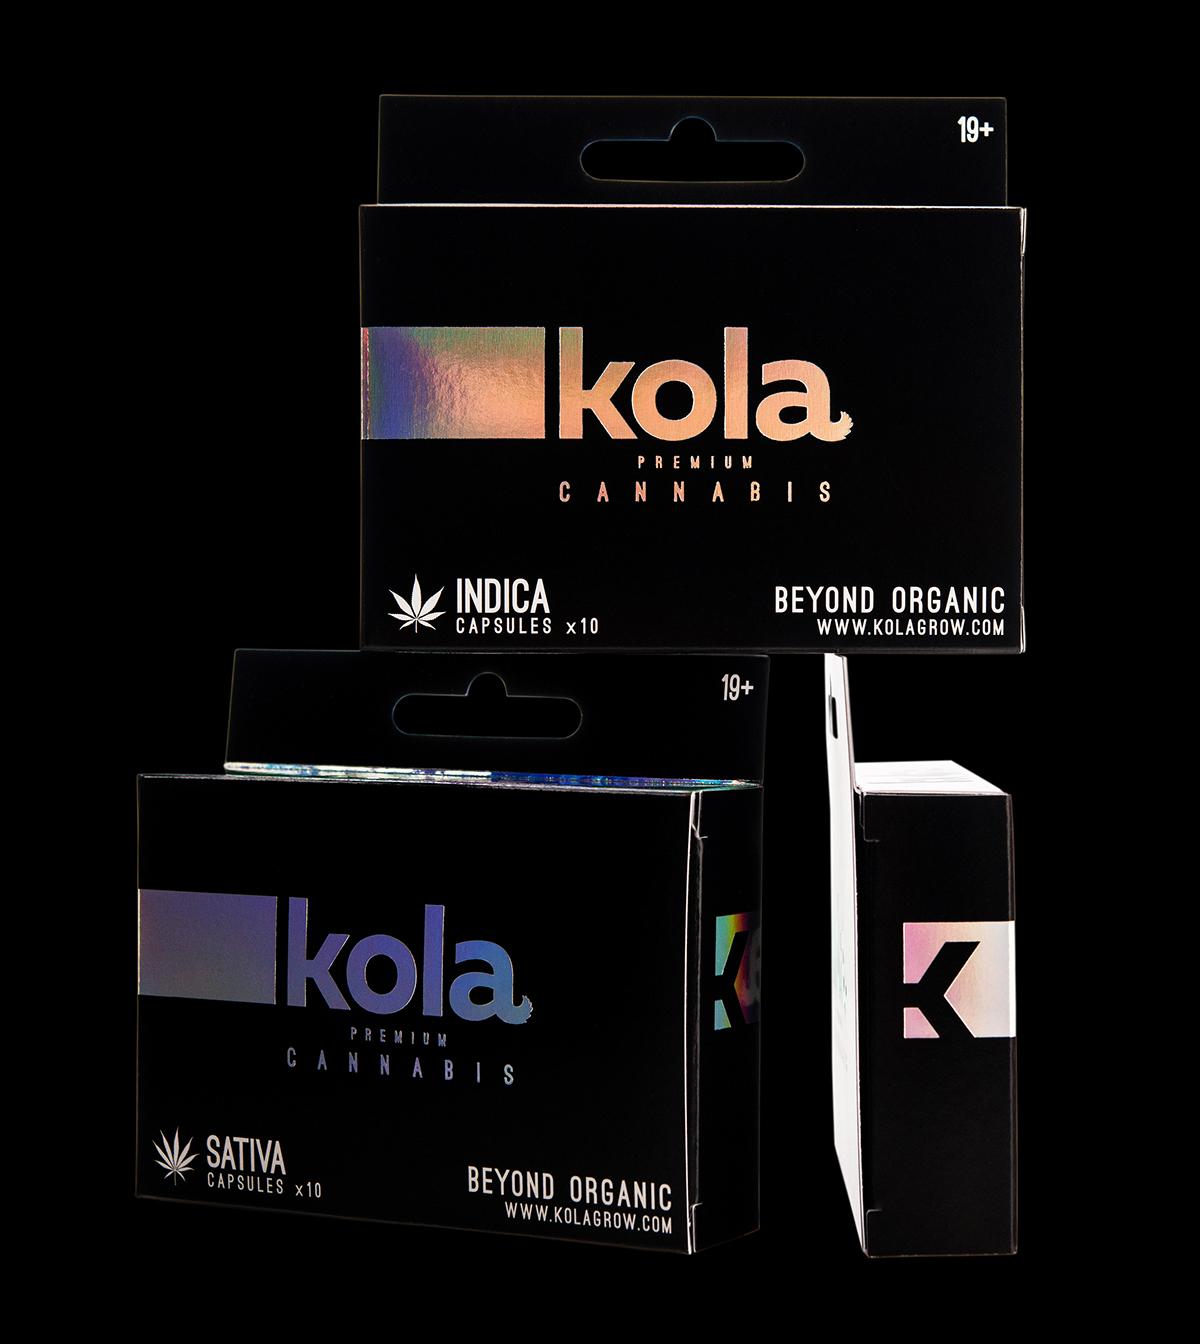 cannabis,marijuana,weed,cannabis branding,Cannabis Packaging,marijuana branding,marijuana packaging,weed branding,weed packaging,Black box